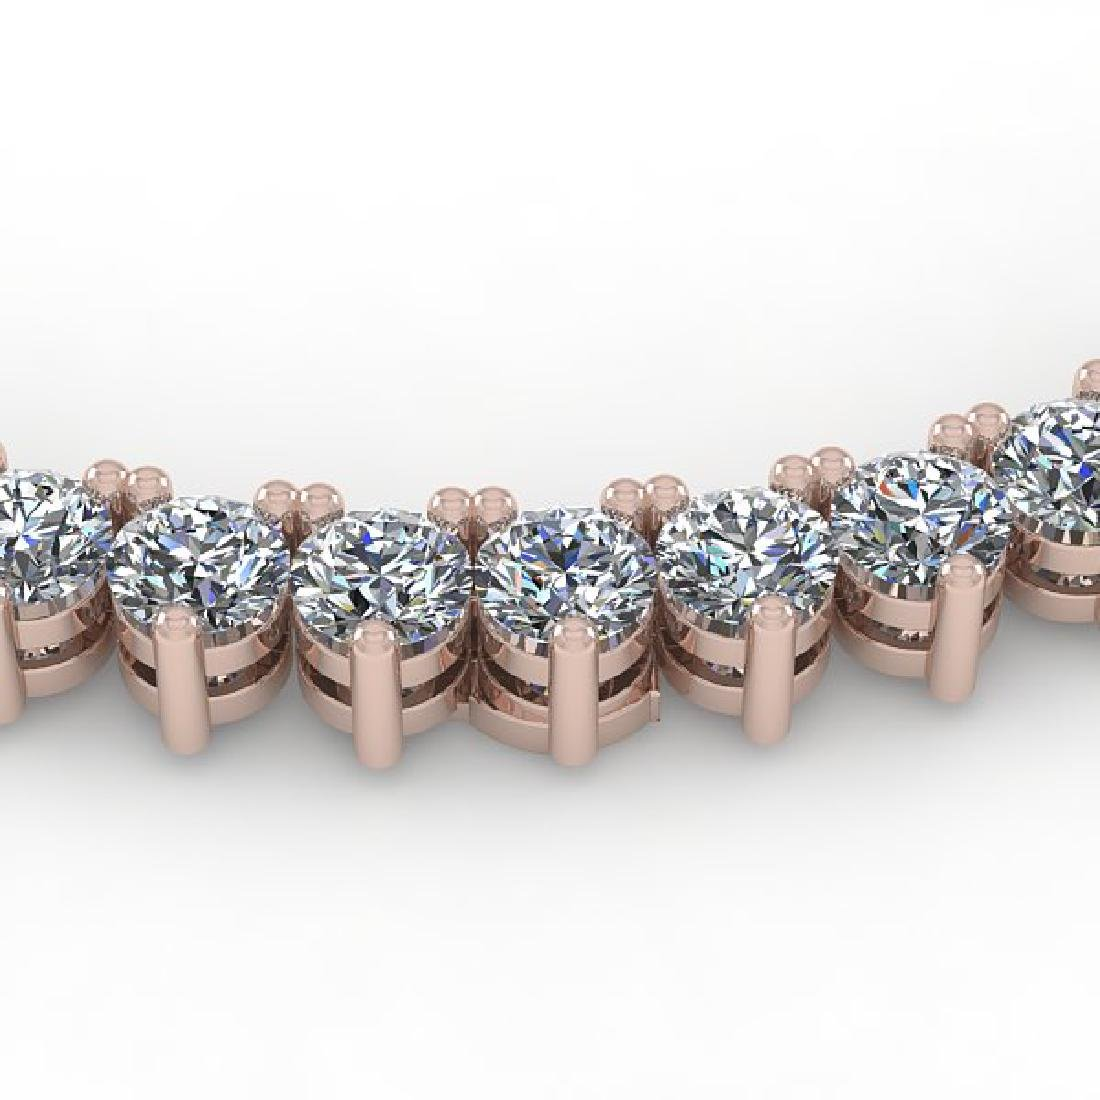 10 CTW Solitaire VS/SI Diamond Necklace 14K Rose Gold